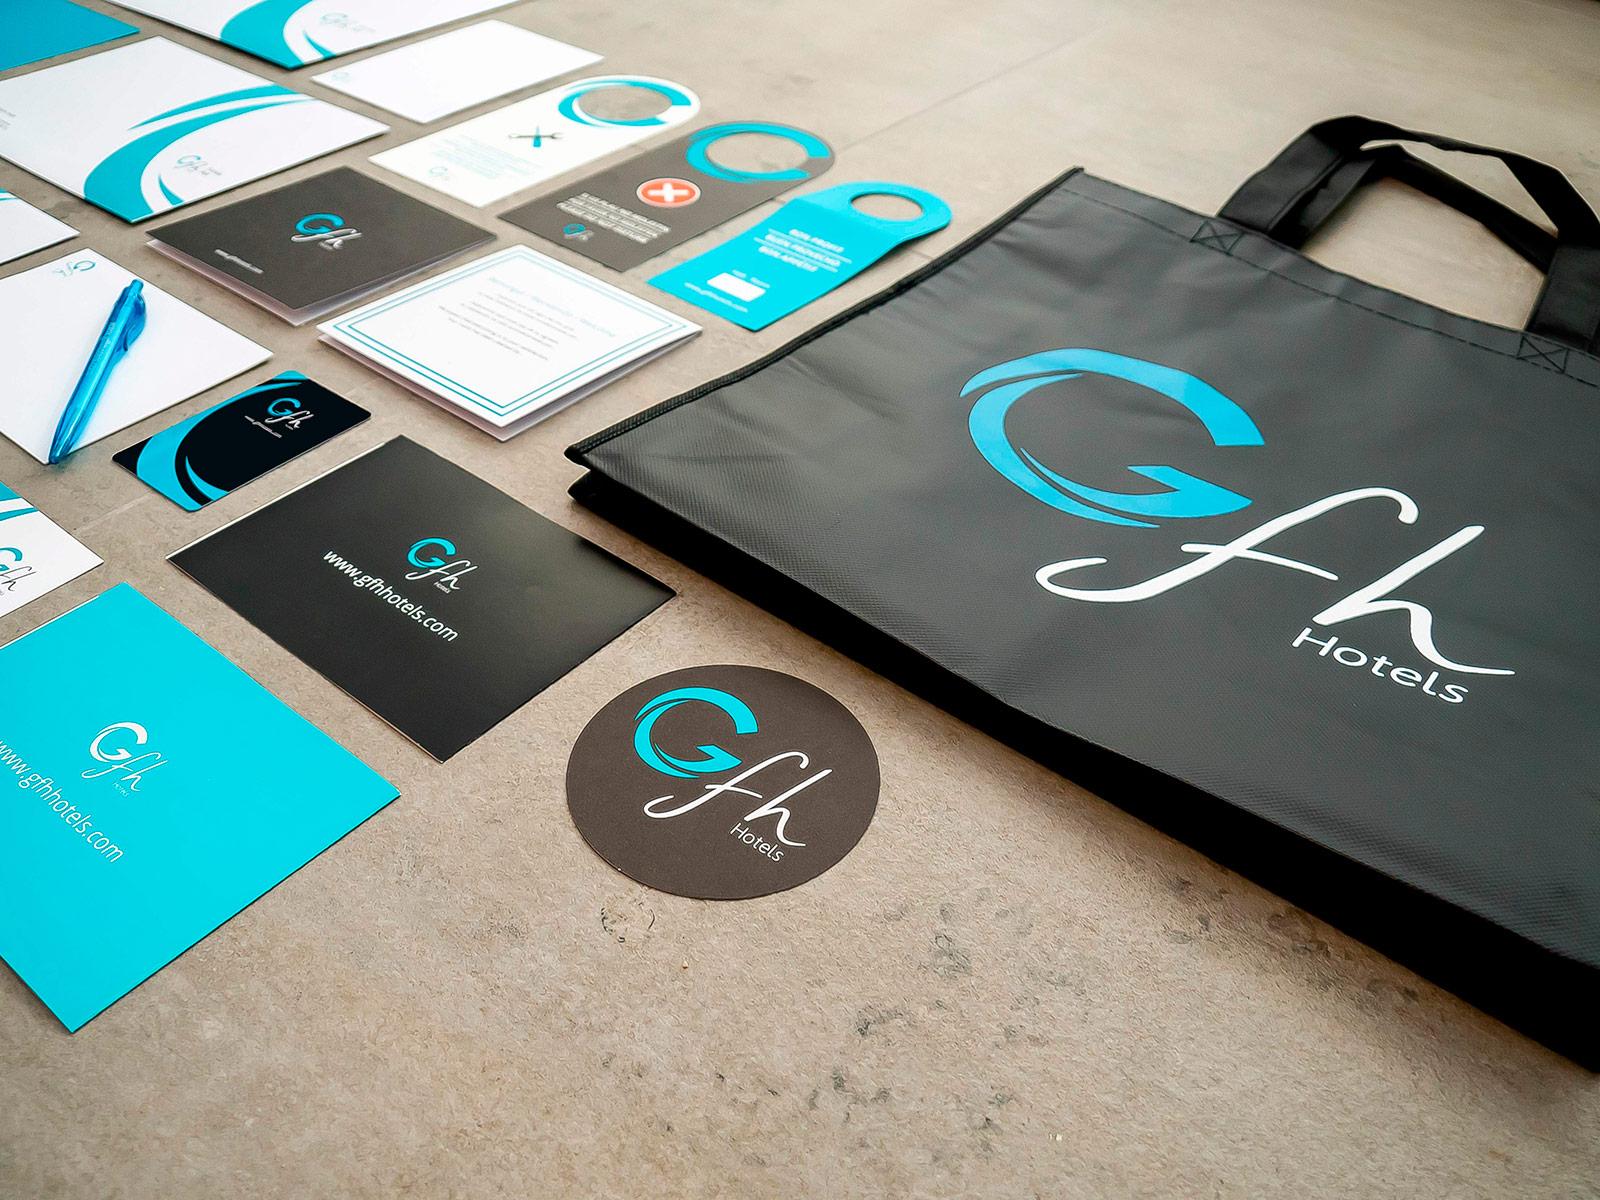 diseño grafico  Identidad corporativa     12